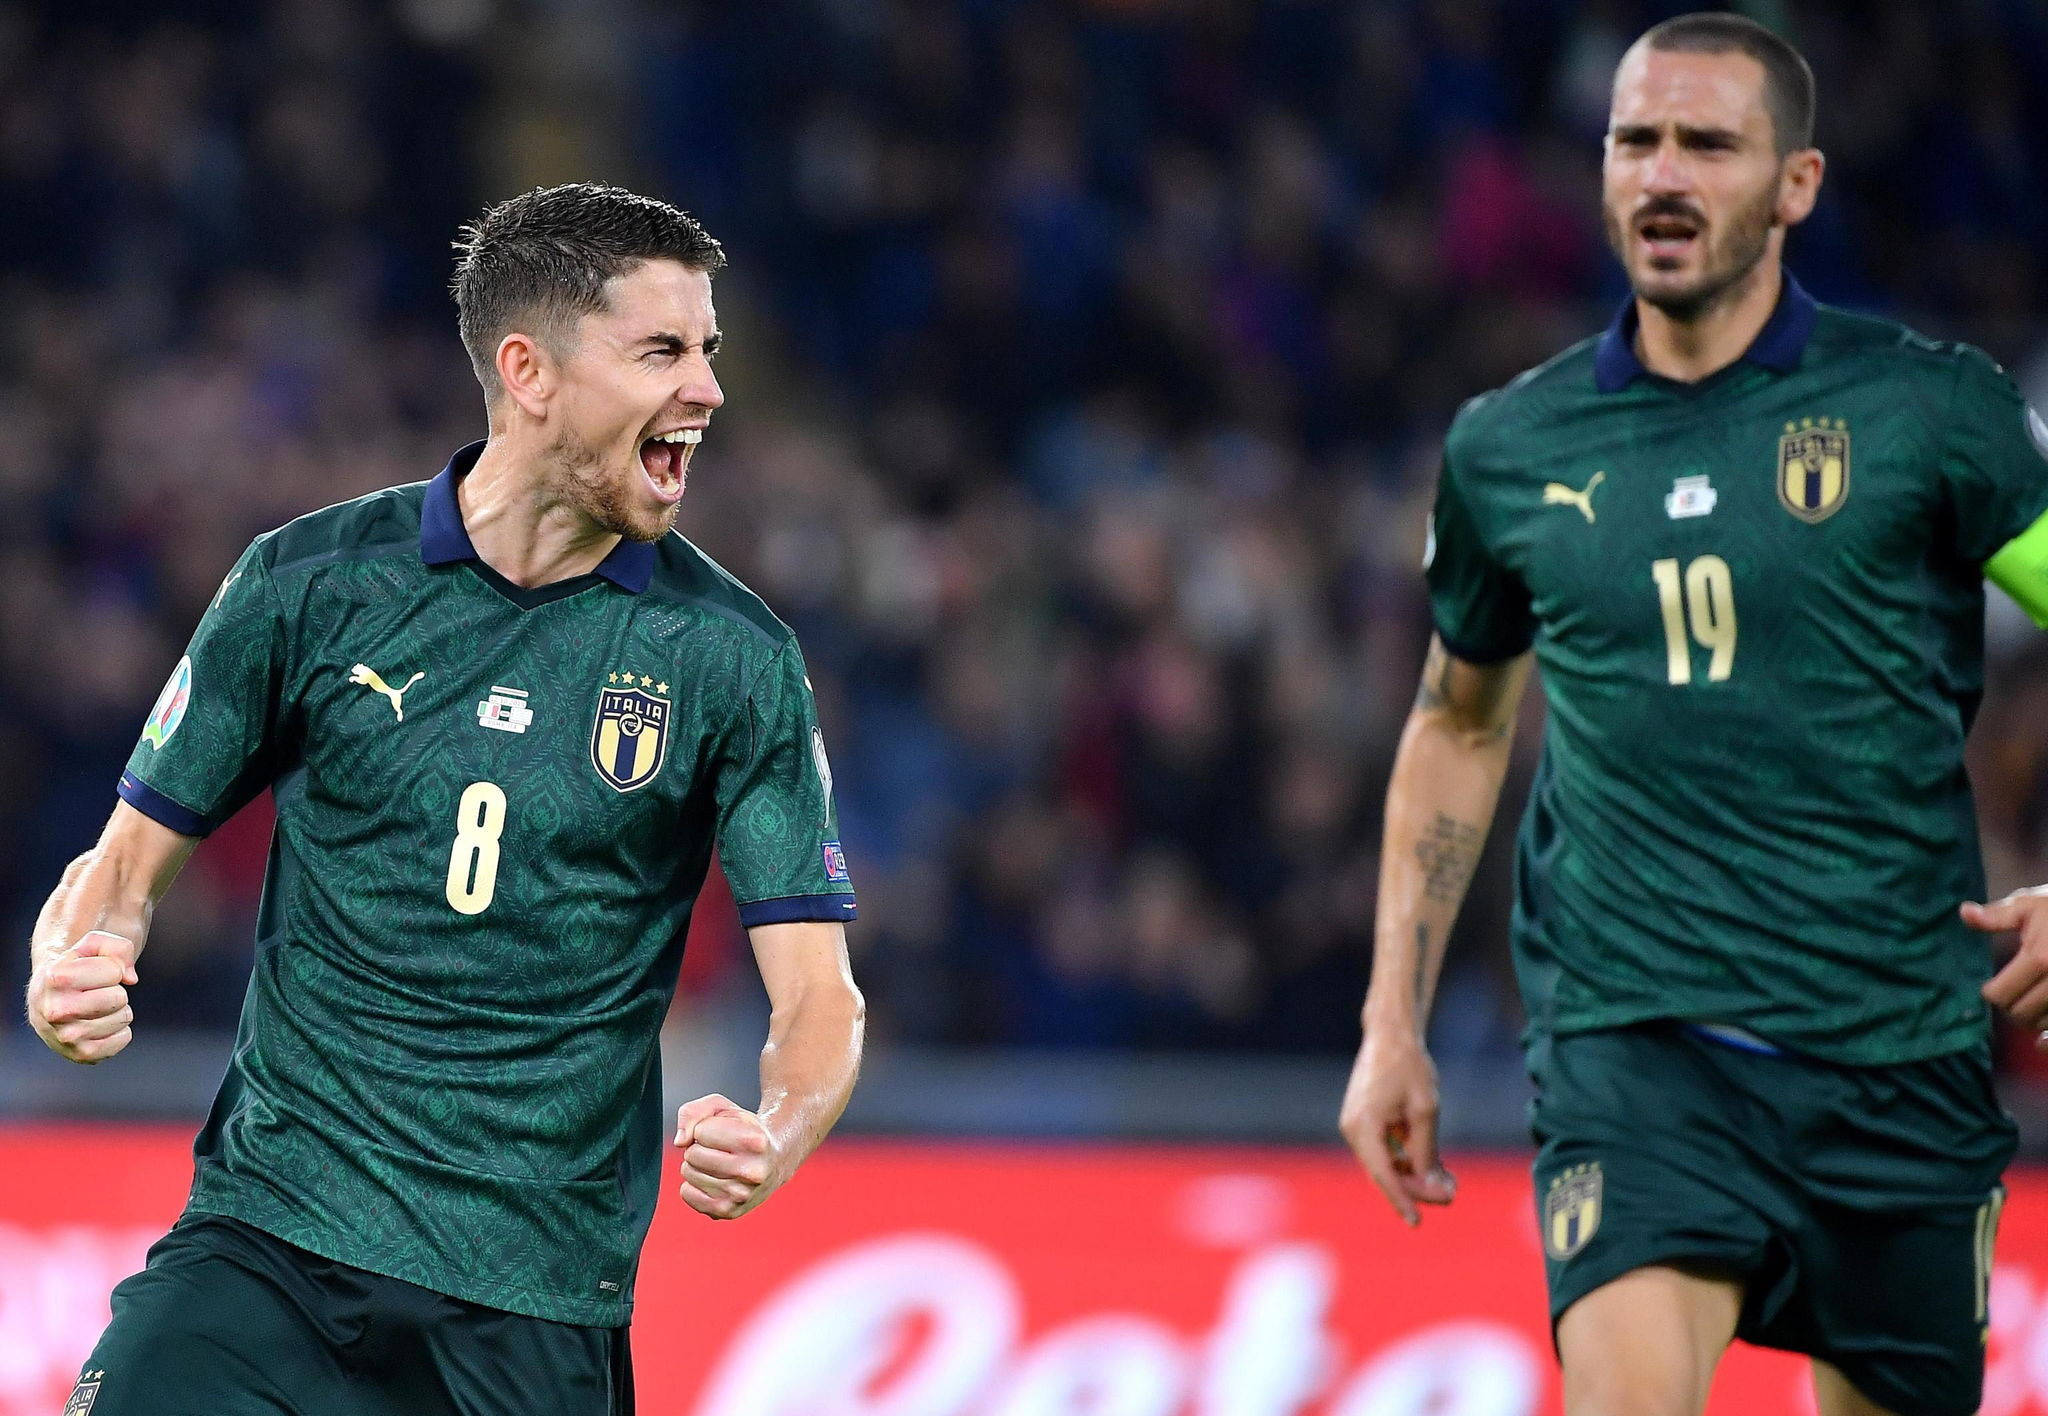 Clasificacion Eurocopa 2020: Italia se saca la espina del Mundial: gana a Grecia y se clasifica para la Eurocopa - Clasificación Eurocopa